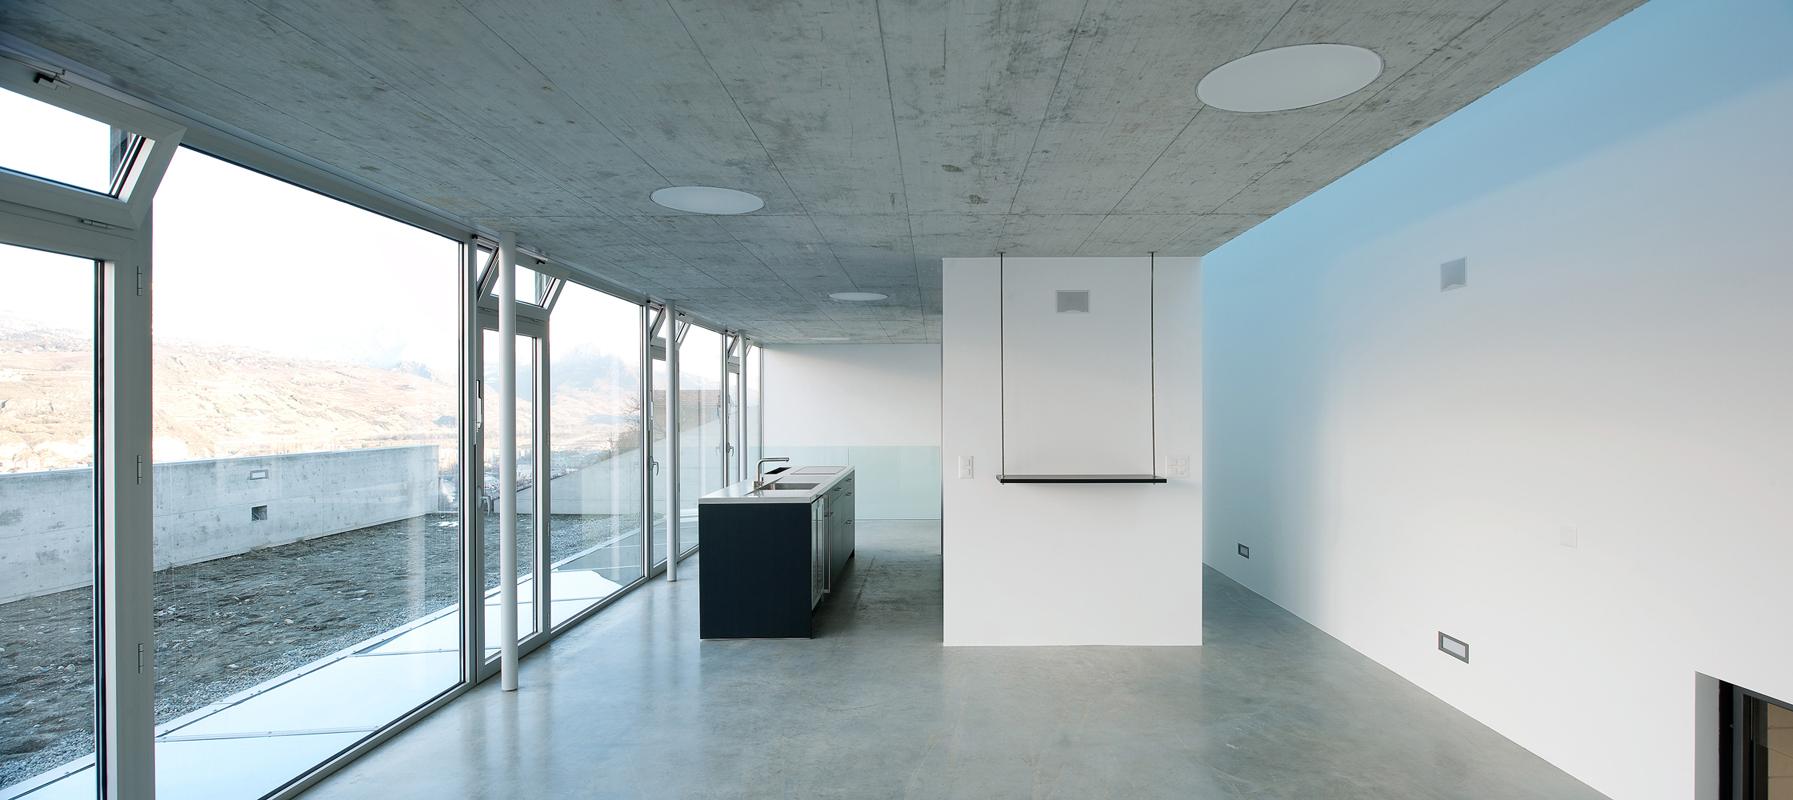 habitation pilloud - 2009 © Thomas Jantscher